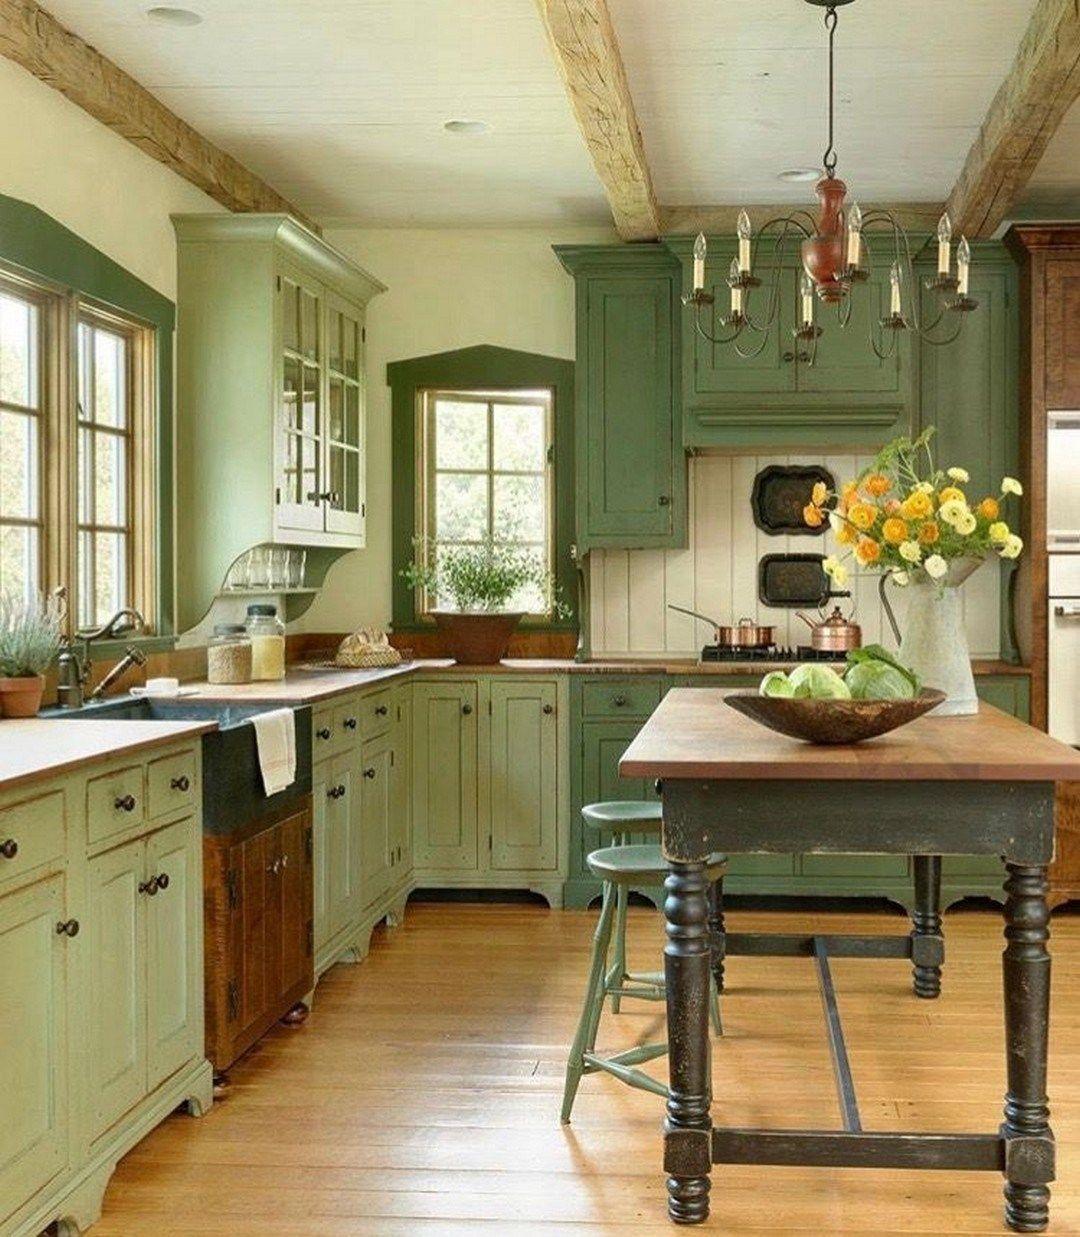 Green Kitchen Cabinets New Kitchen Cabinets Kitchen Renovation Rustic Kitchen Ki In 2020 Green Kitchen Cabinets Kitchen Cabinet Colors New Kitchen Cabinets